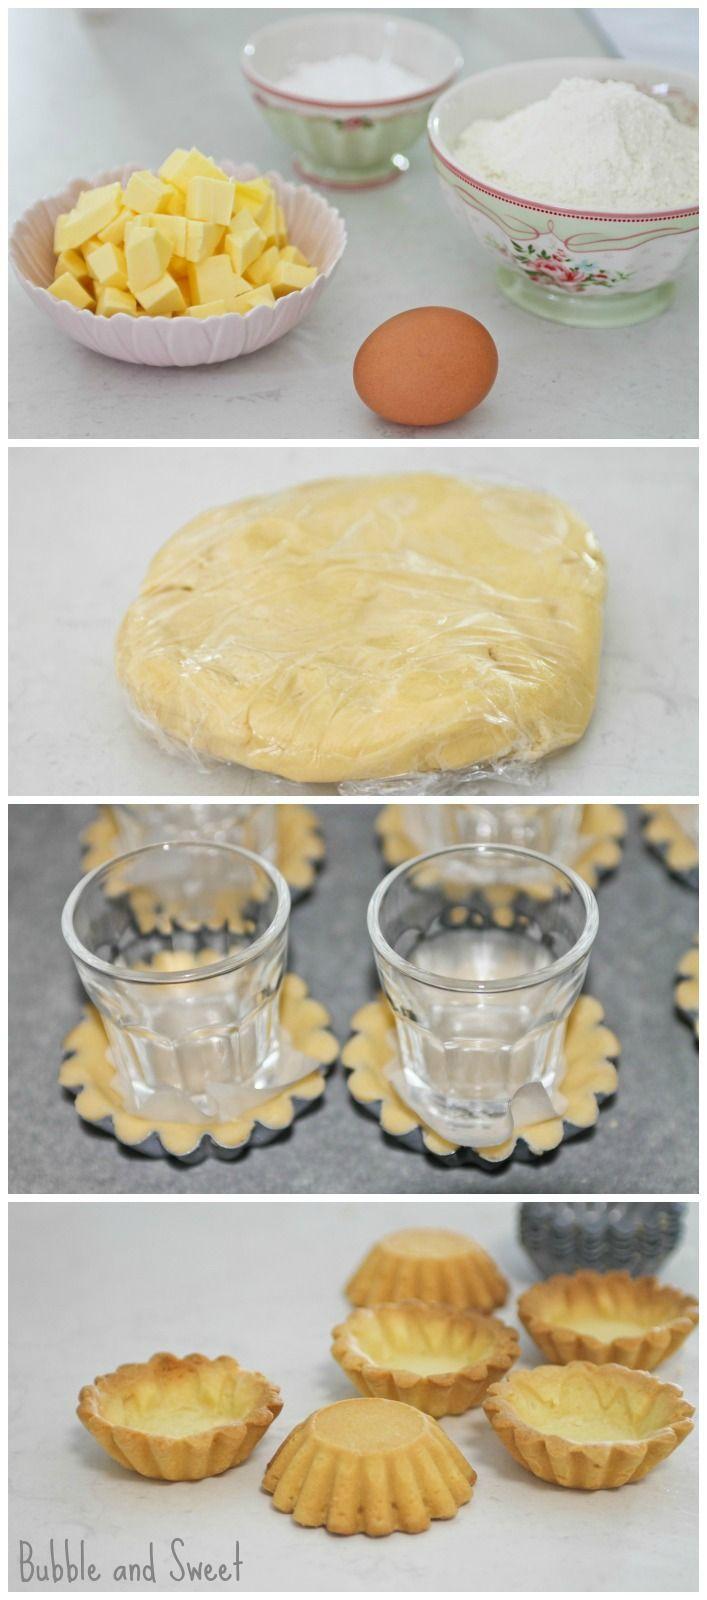 http://bubbleandsweet.blogspot.se/2014/05/homemade-sweet-pastry-shell-recipe.html